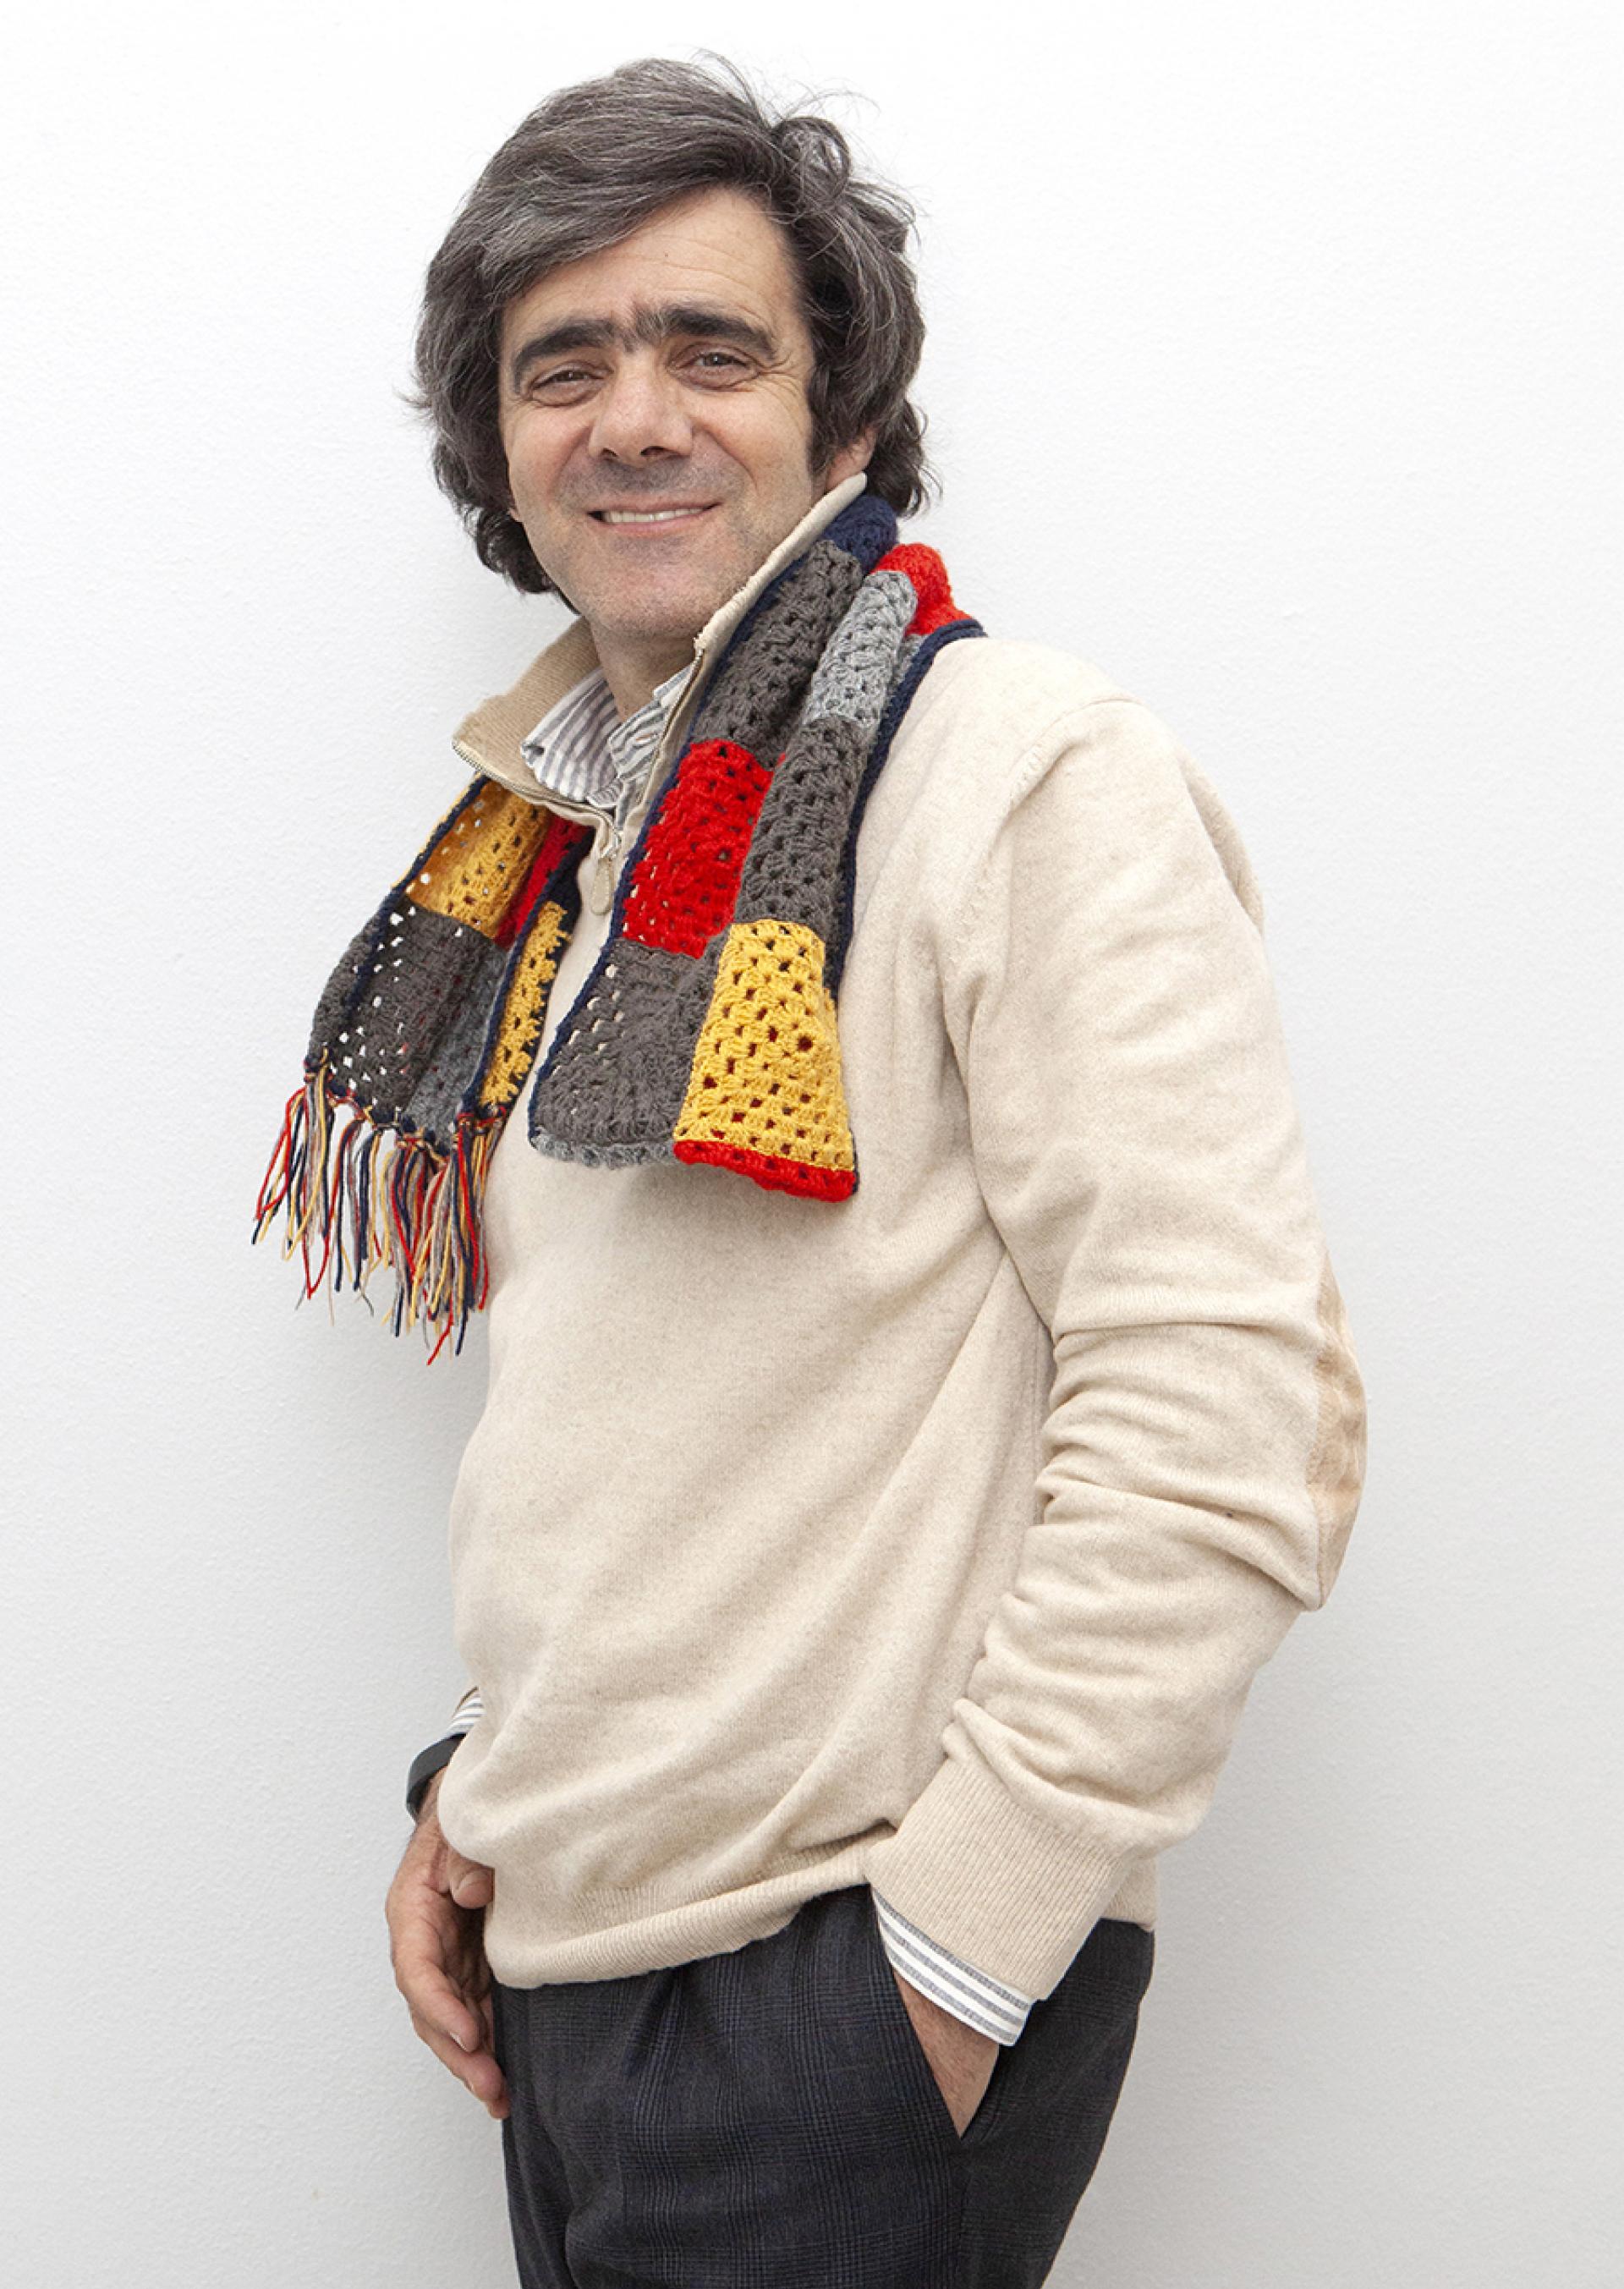 Antonio Monte